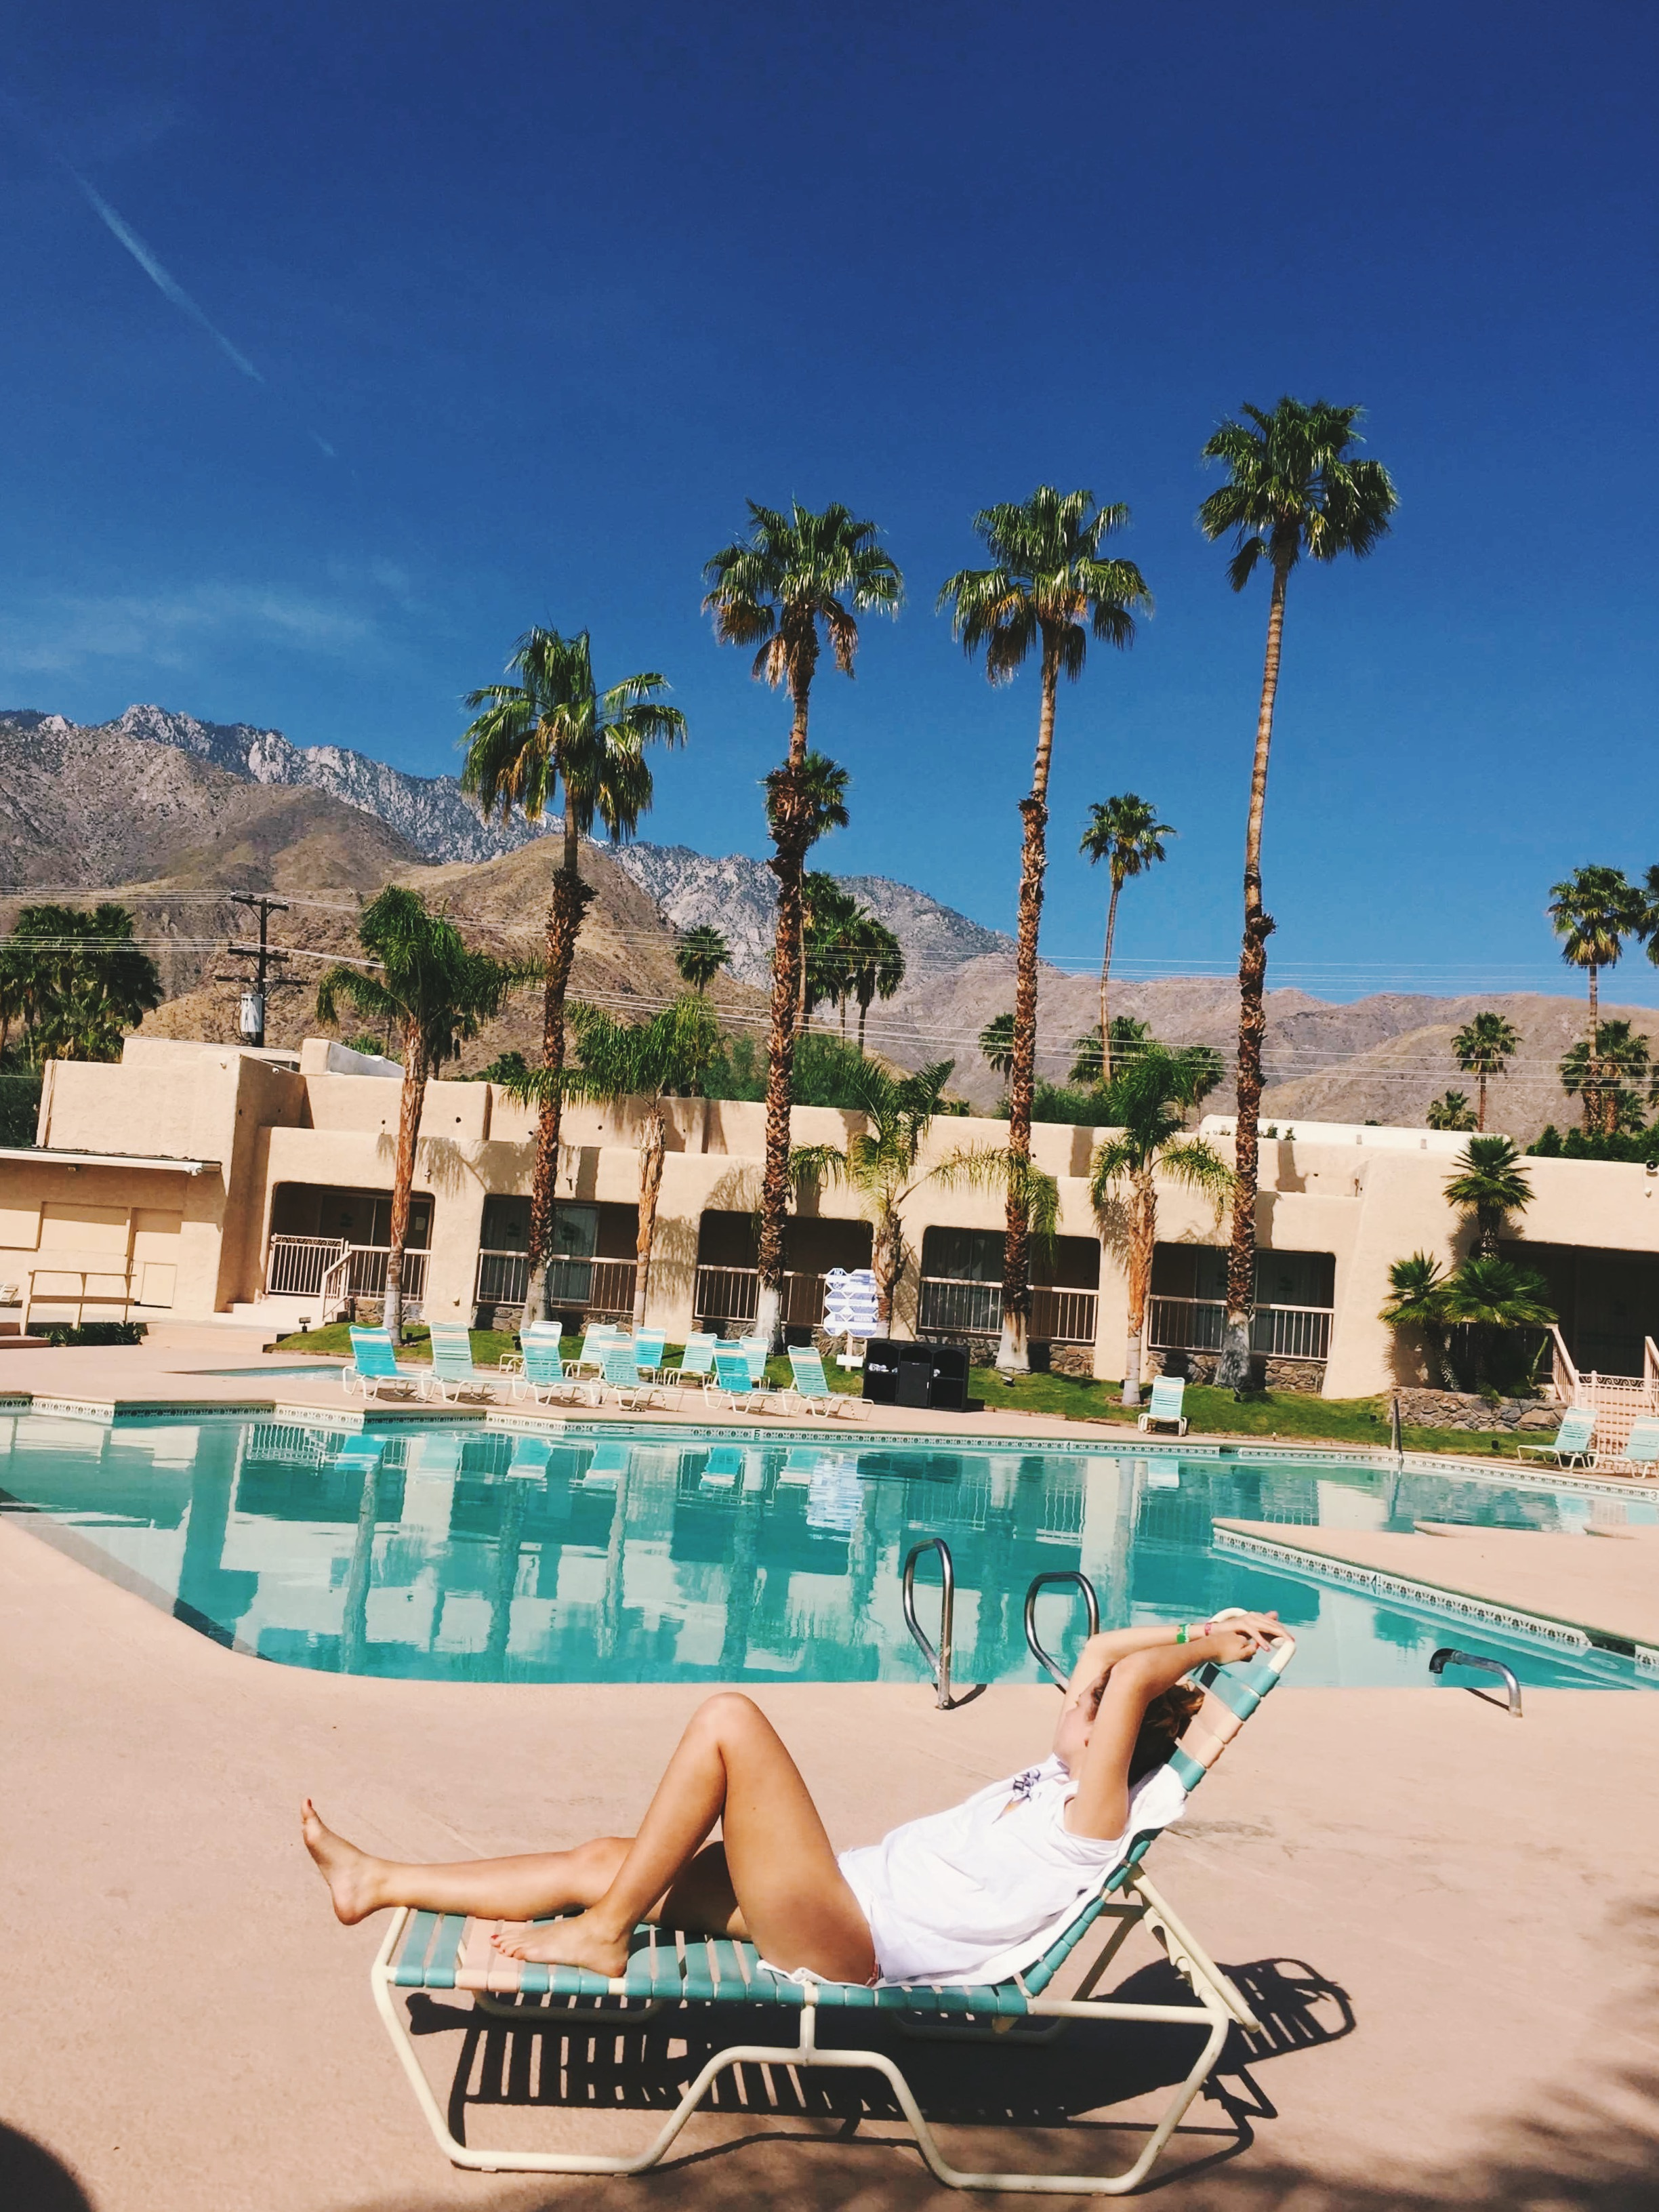 Days Inn Palm Springs, Coachella Accomodation